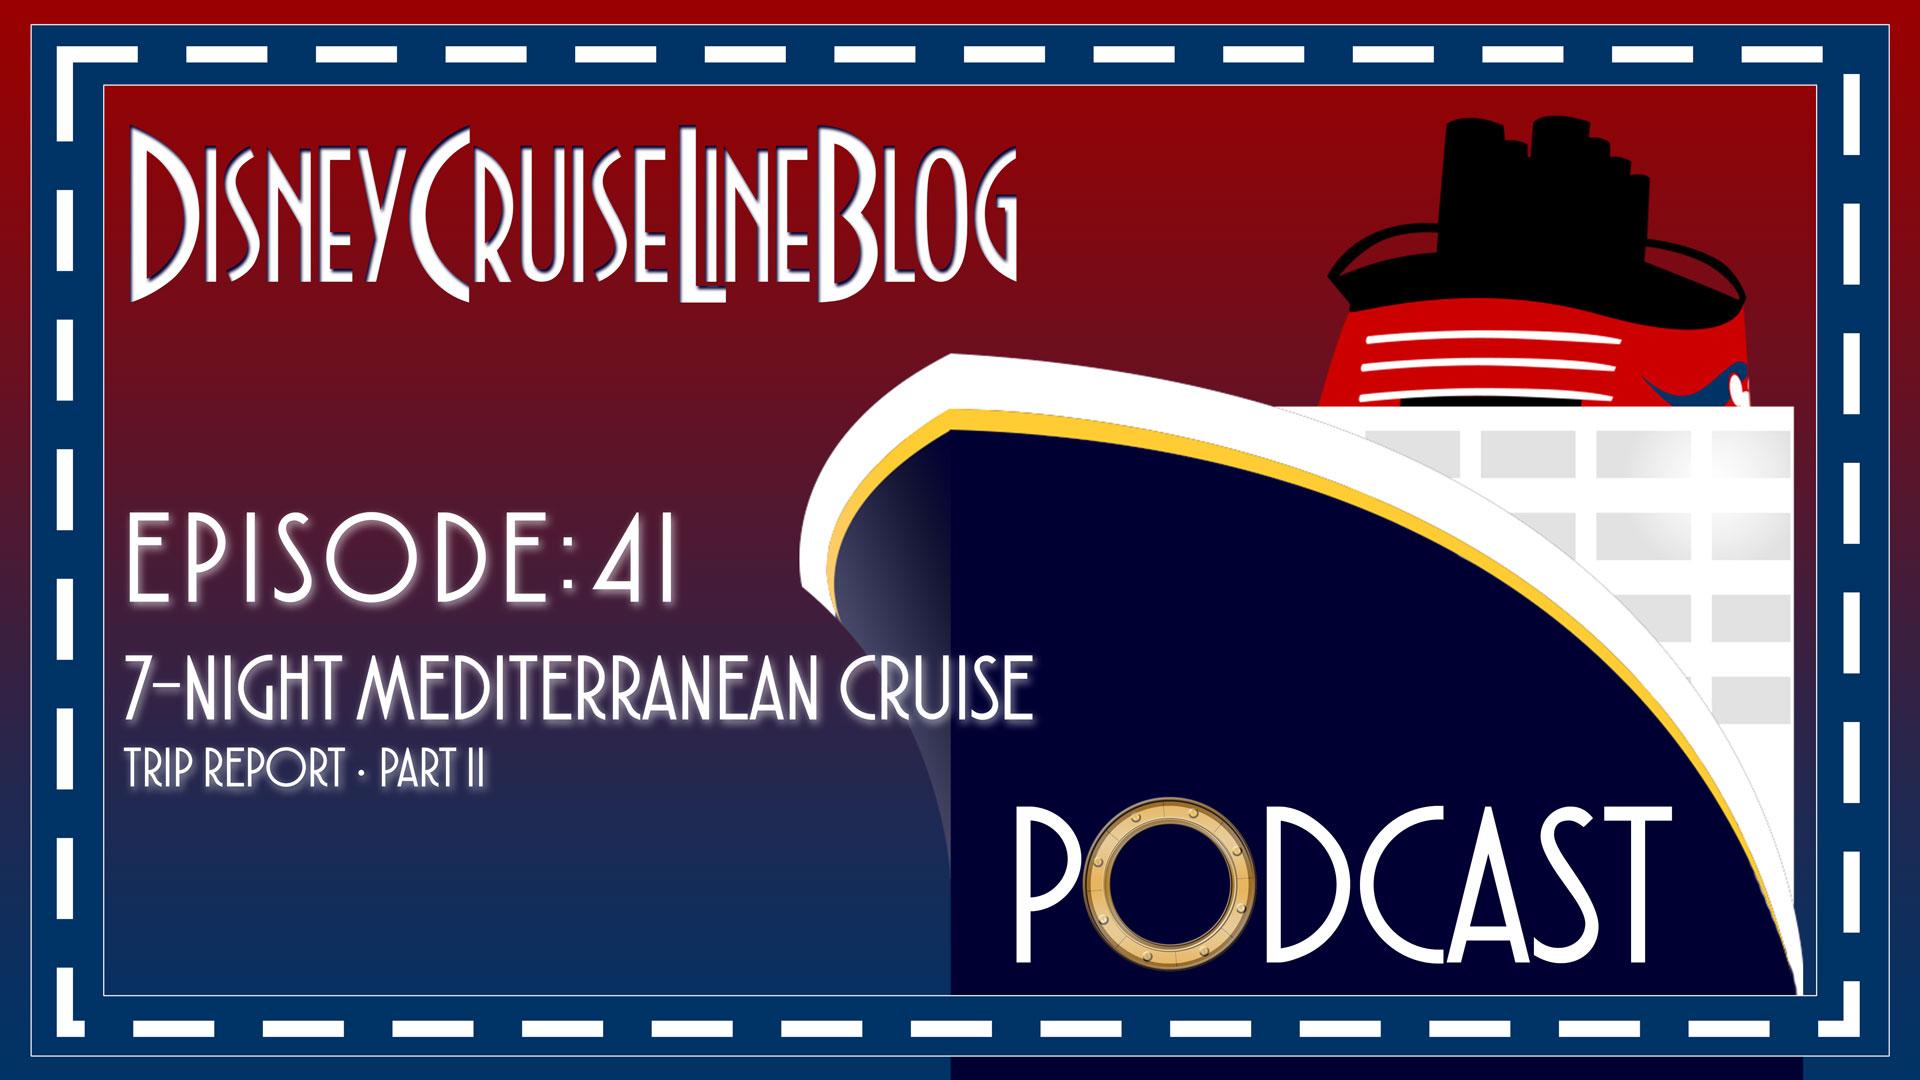 DCL Blog Podcast Episode 41 7night Mediterranean Trip Report Part 2